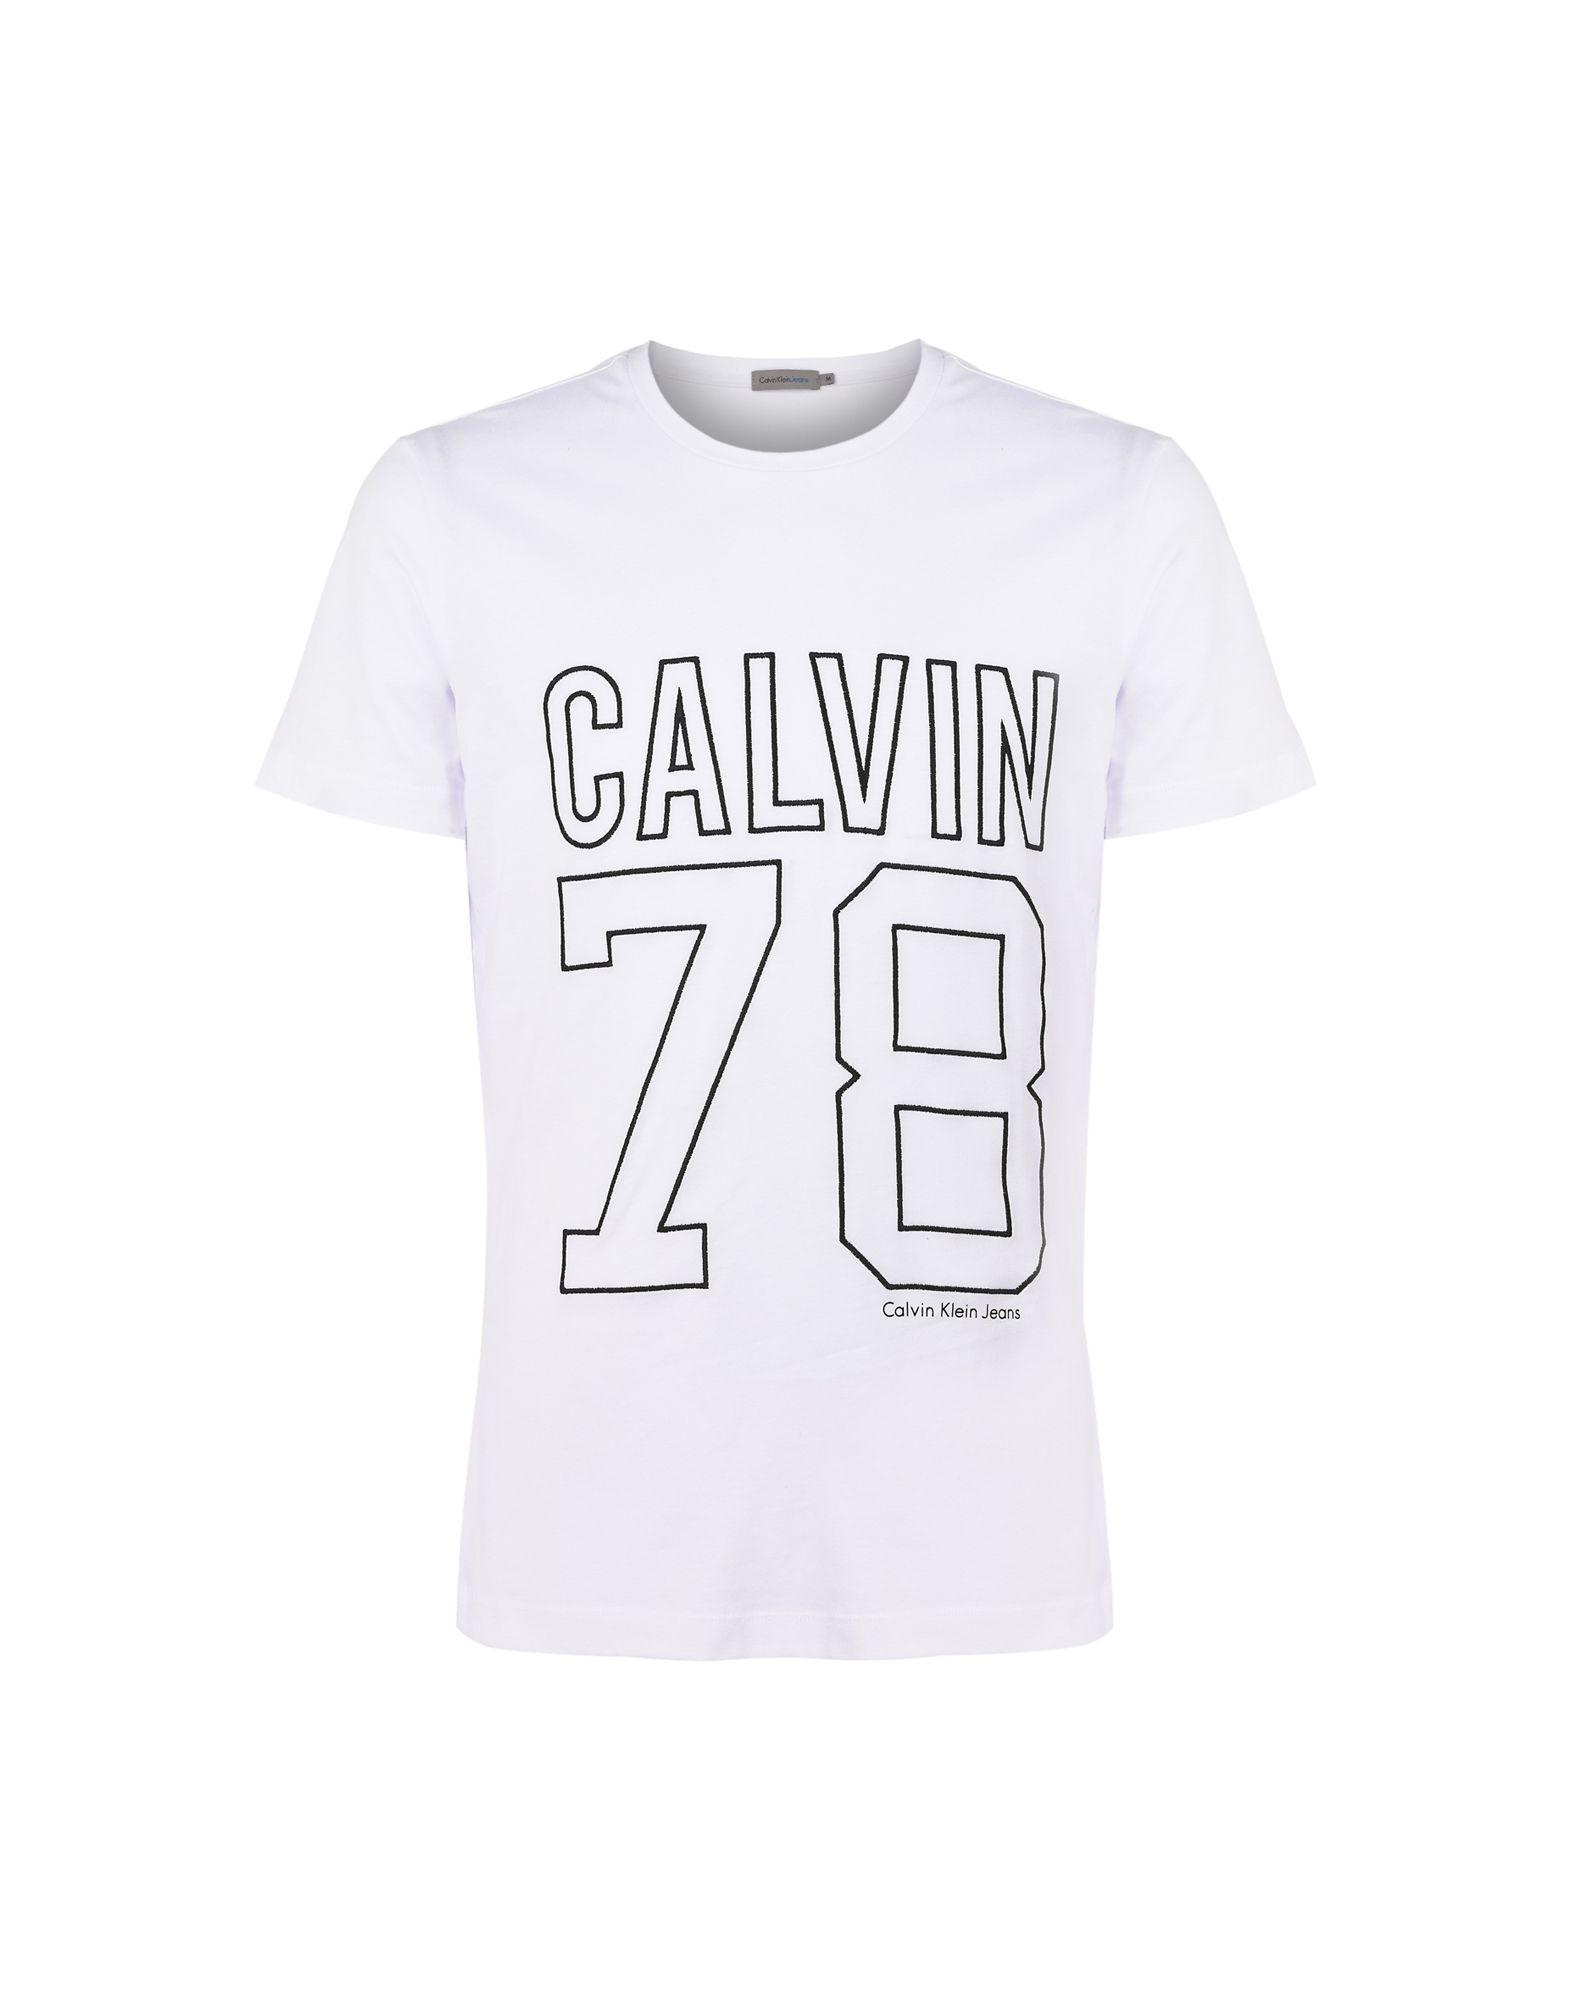 CALVIN KLEIN JEANS Футболка кошелек calvin klein jeans calvin klein jeans ca939bwapqt1